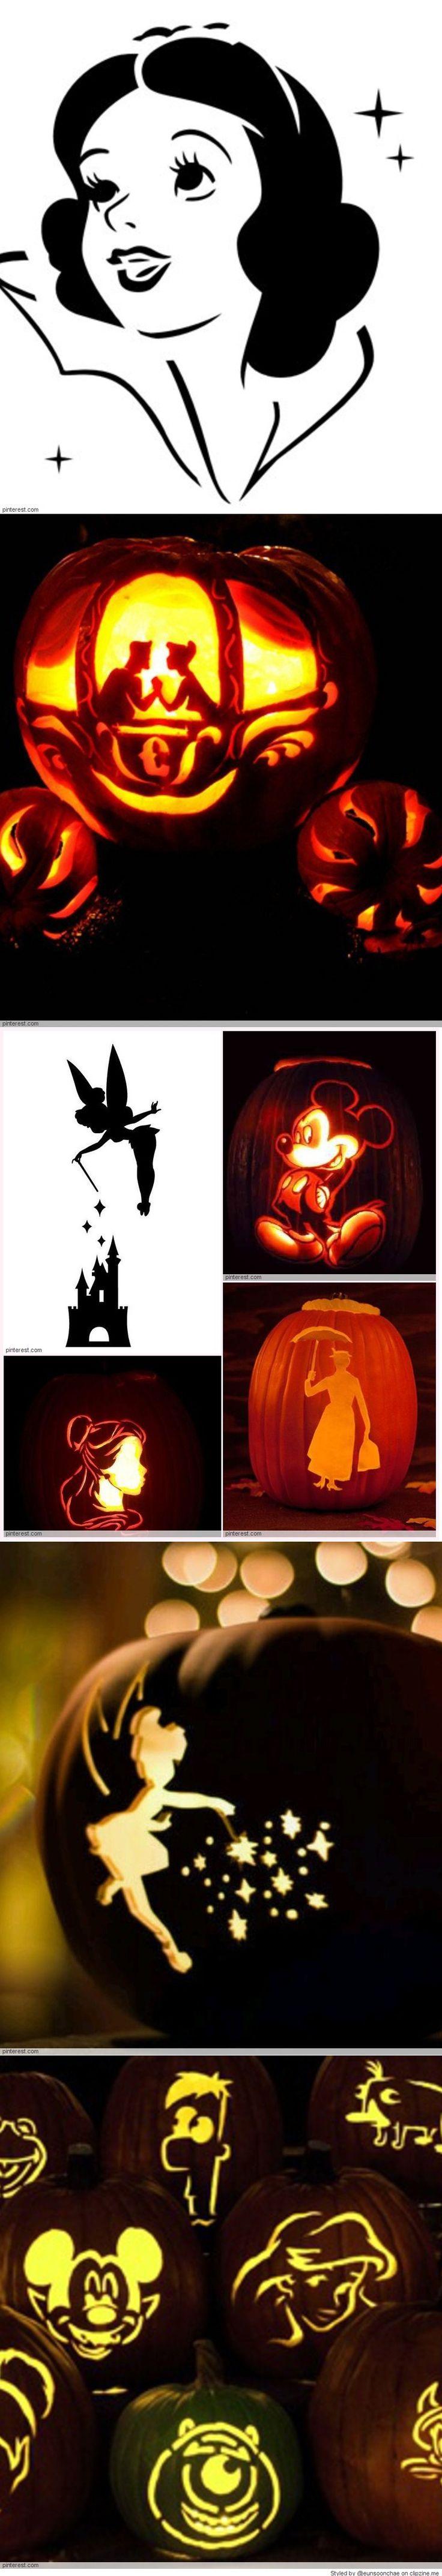 57 besten TÖKÖK Bilder auf Pinterest | Halloween ideen, Halloween ...